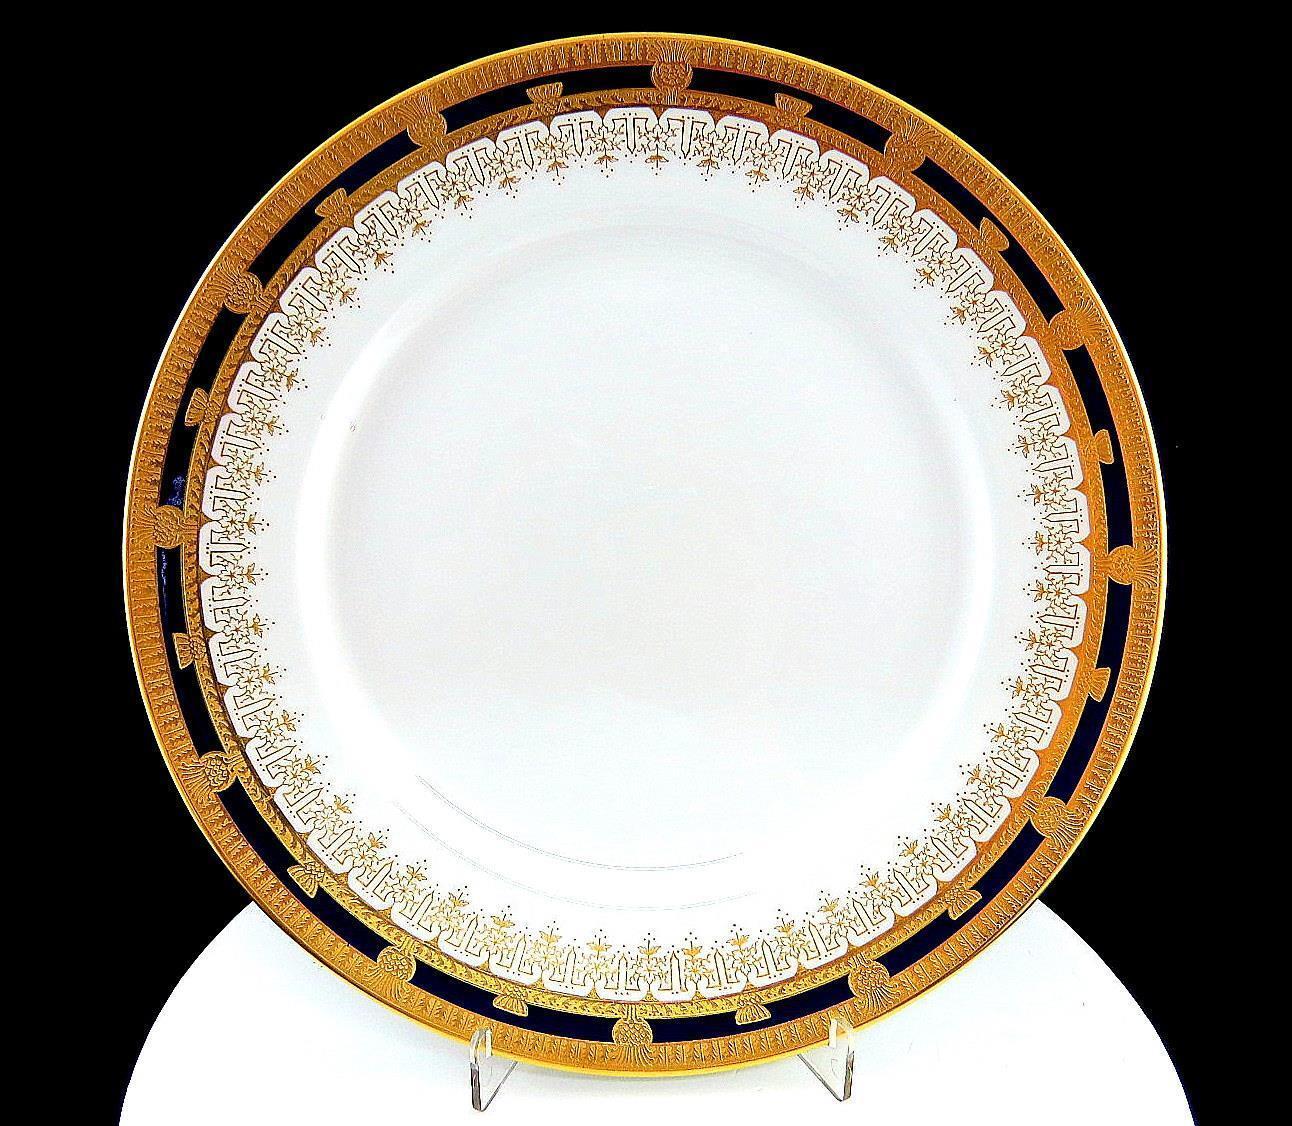 Lenox Raro Doppio oro sopra Cobalto Bordo Flower & Urn Design 10 1cm Piatto